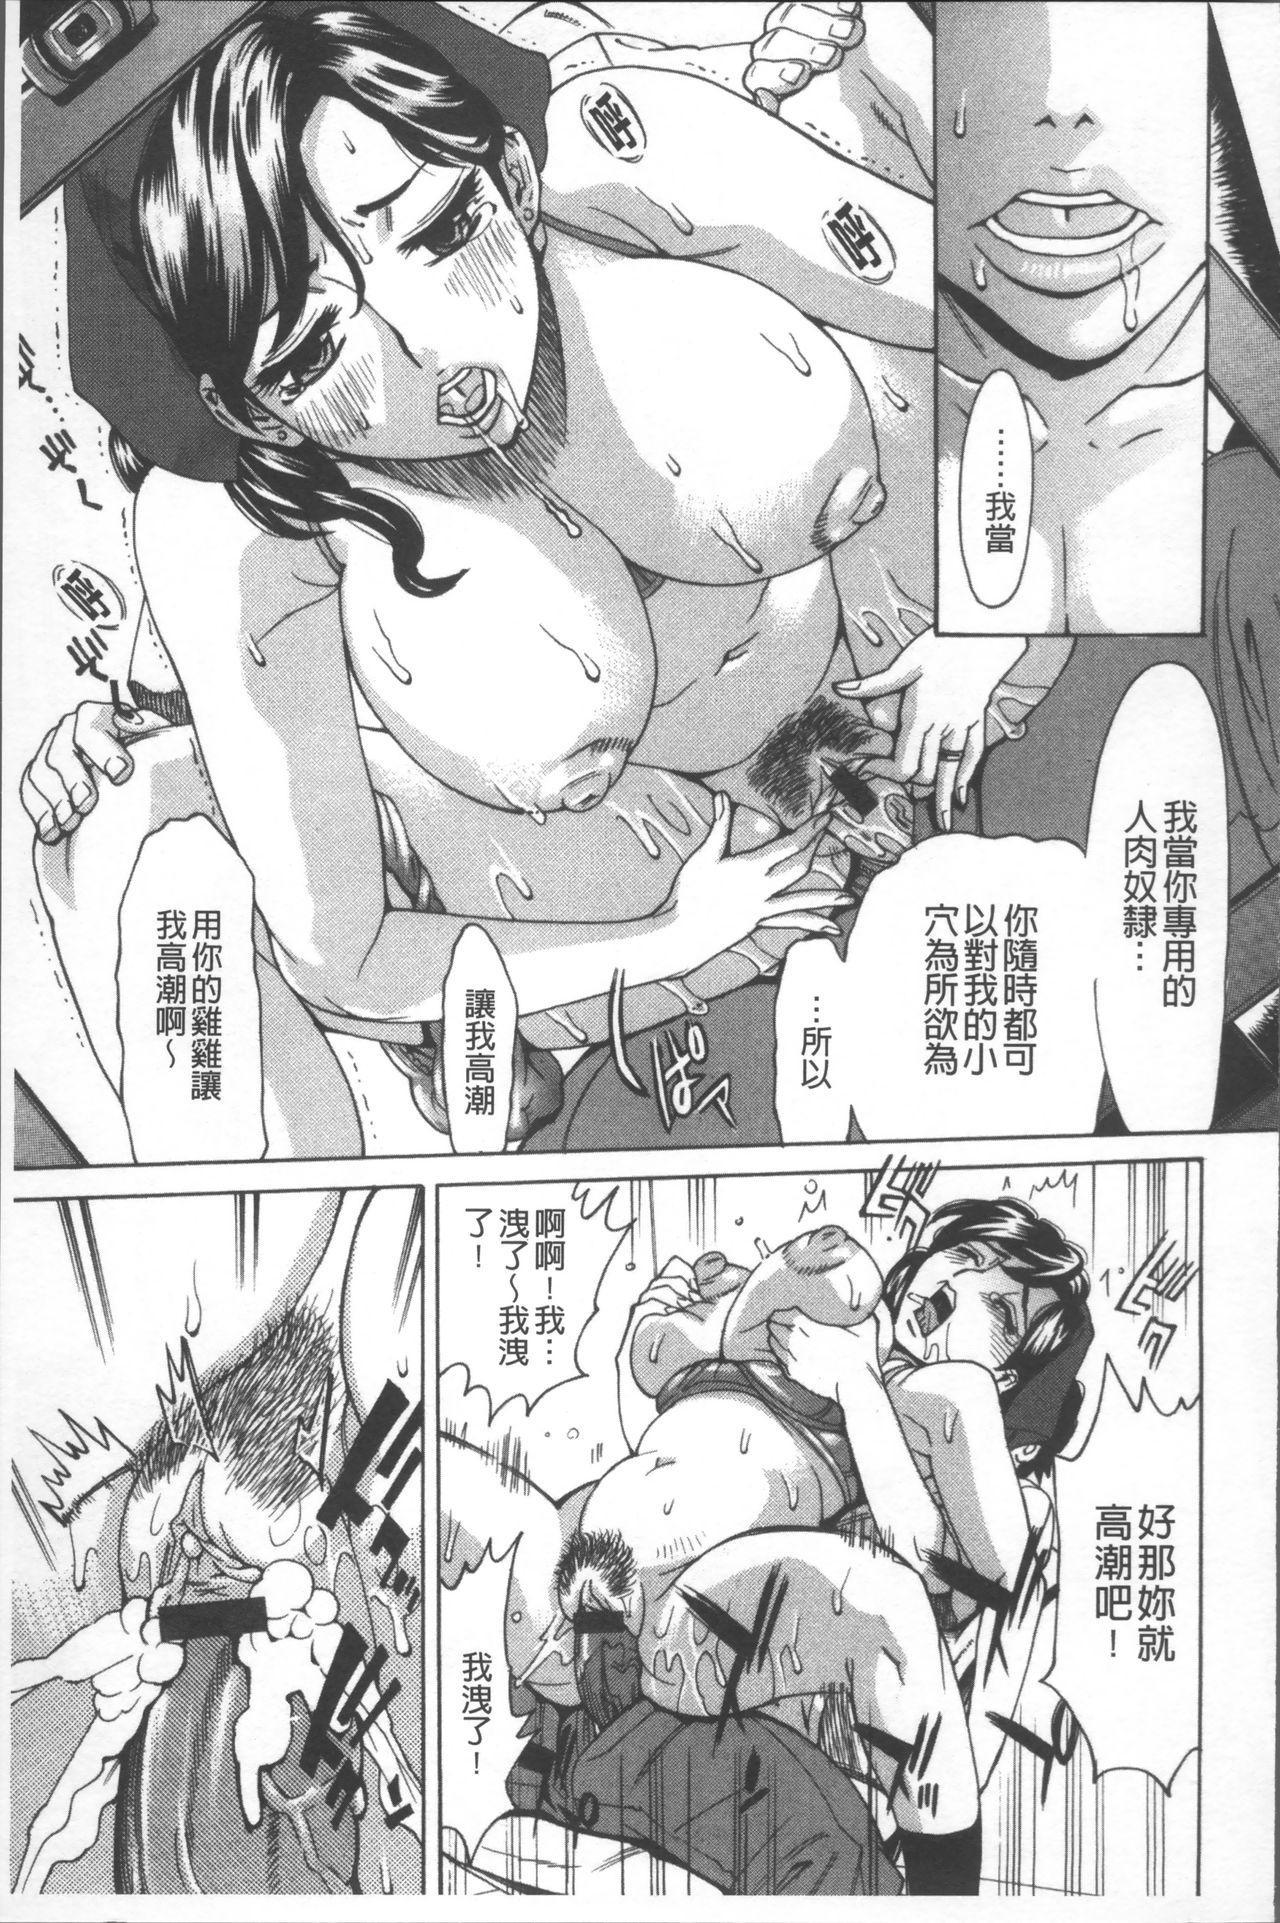 Hitozuma Kanshasai - SUPER EROTIC WIFE'S FESTIVAL 78